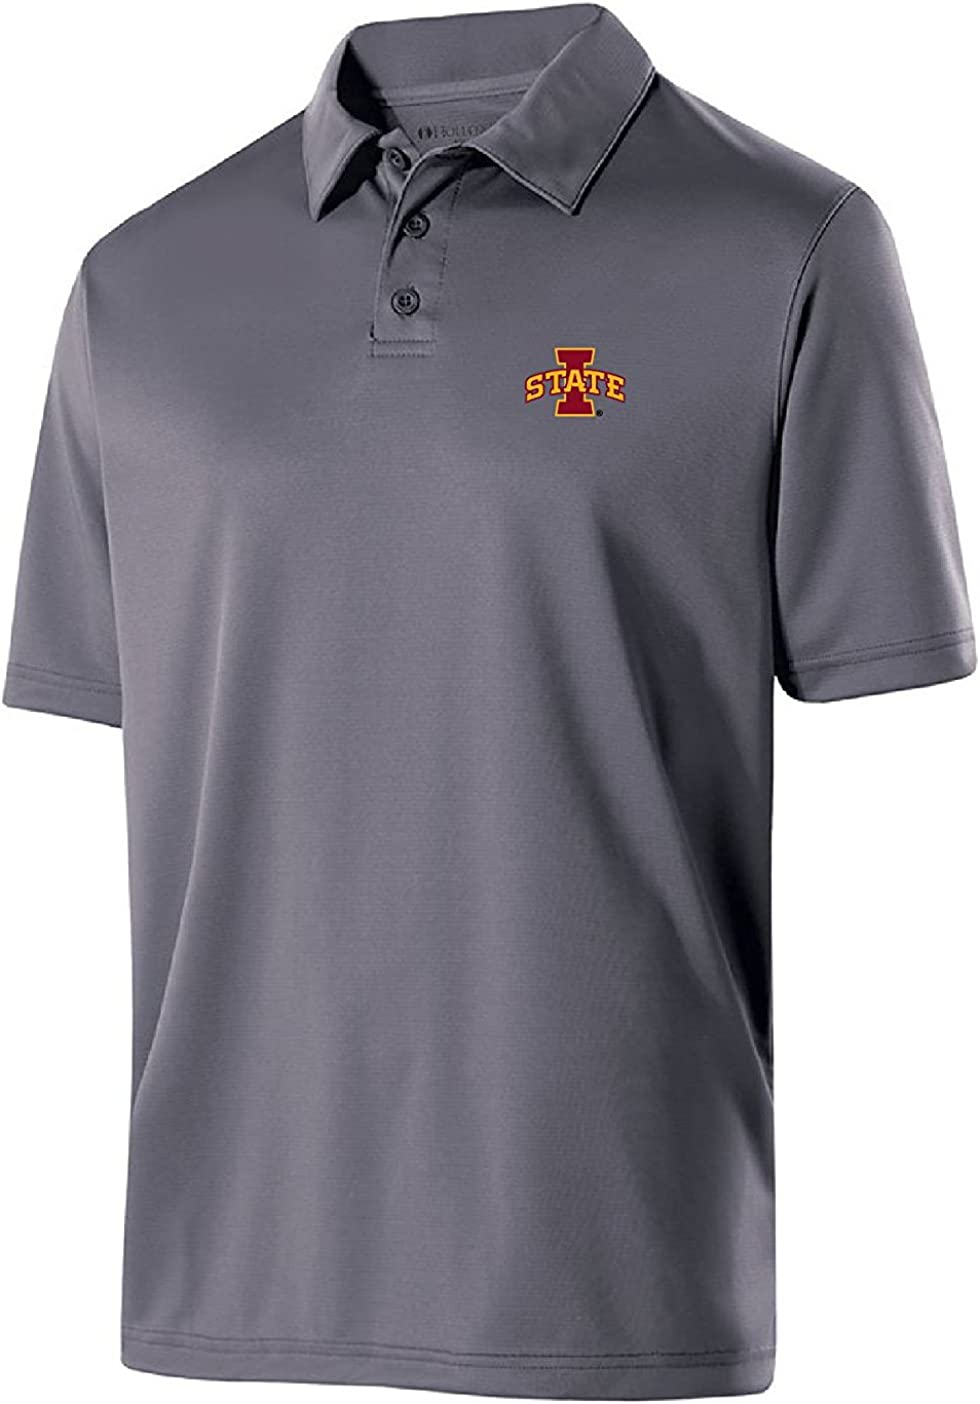 Ouray Sportswear Mens Shift Polo